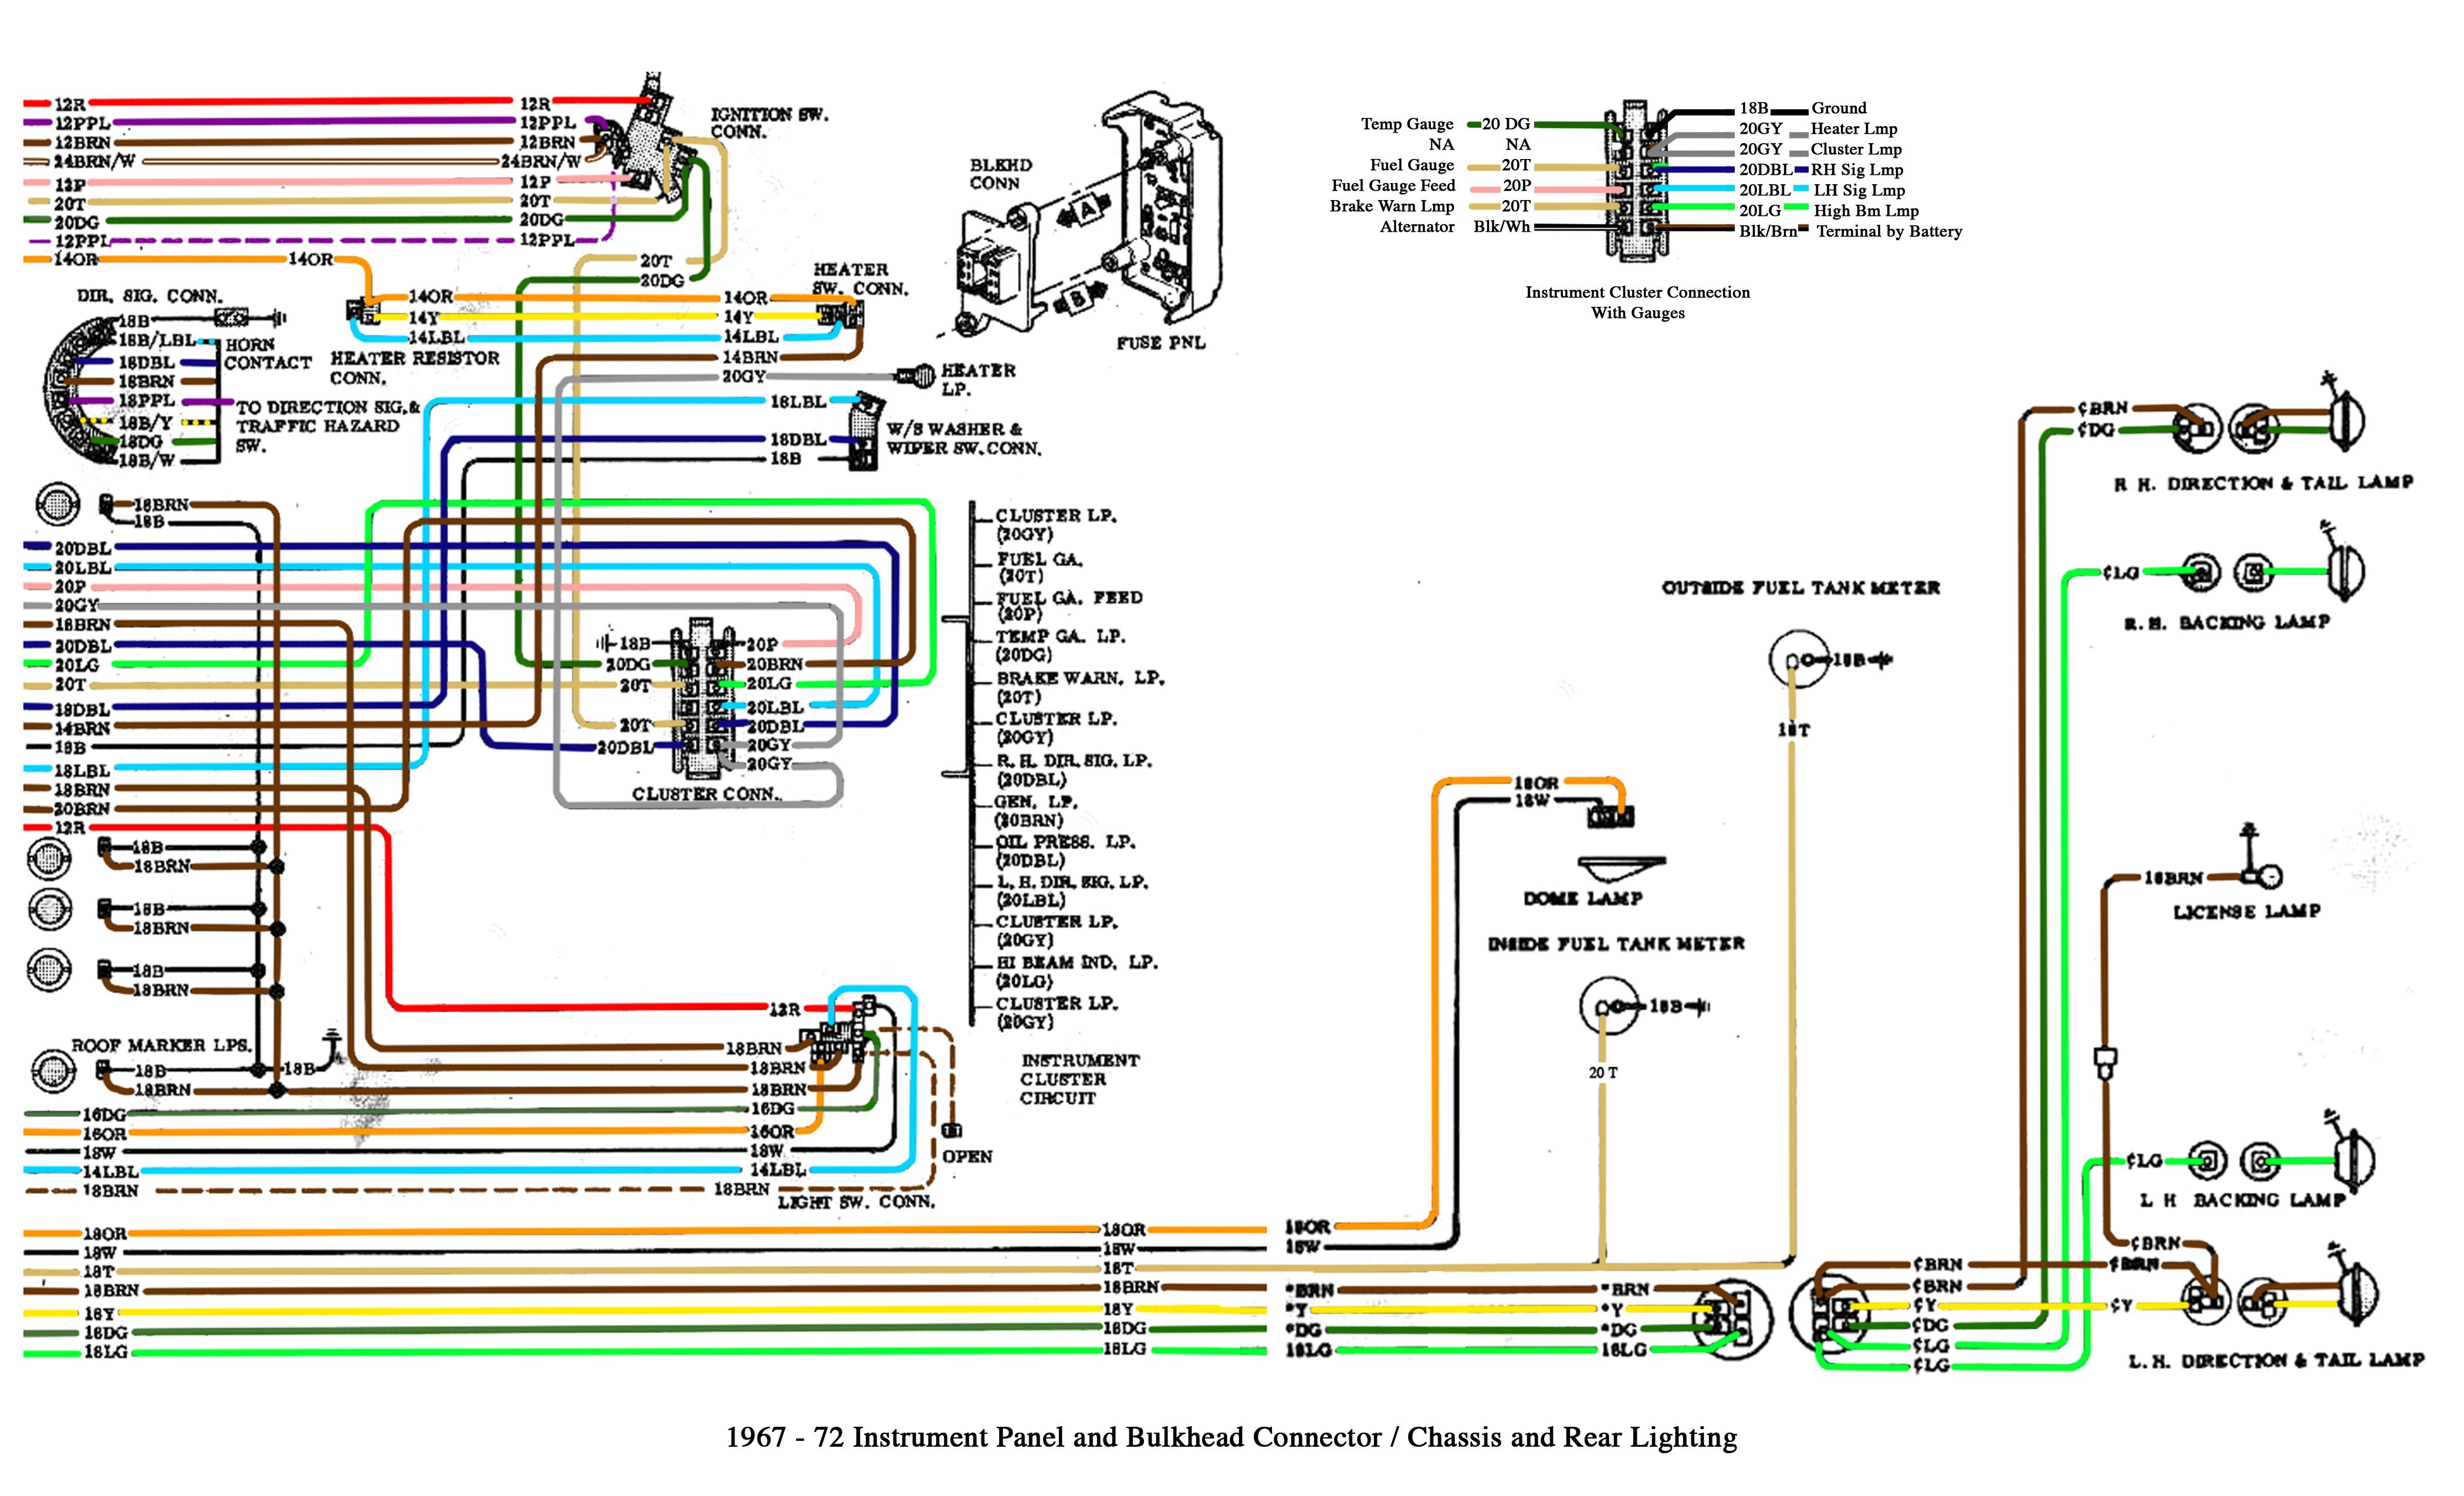 Gmc Truck Wiring Diagram - Wiring Diagram Data Oreo - Ford F150 Trailer Wiring Harness Diagram